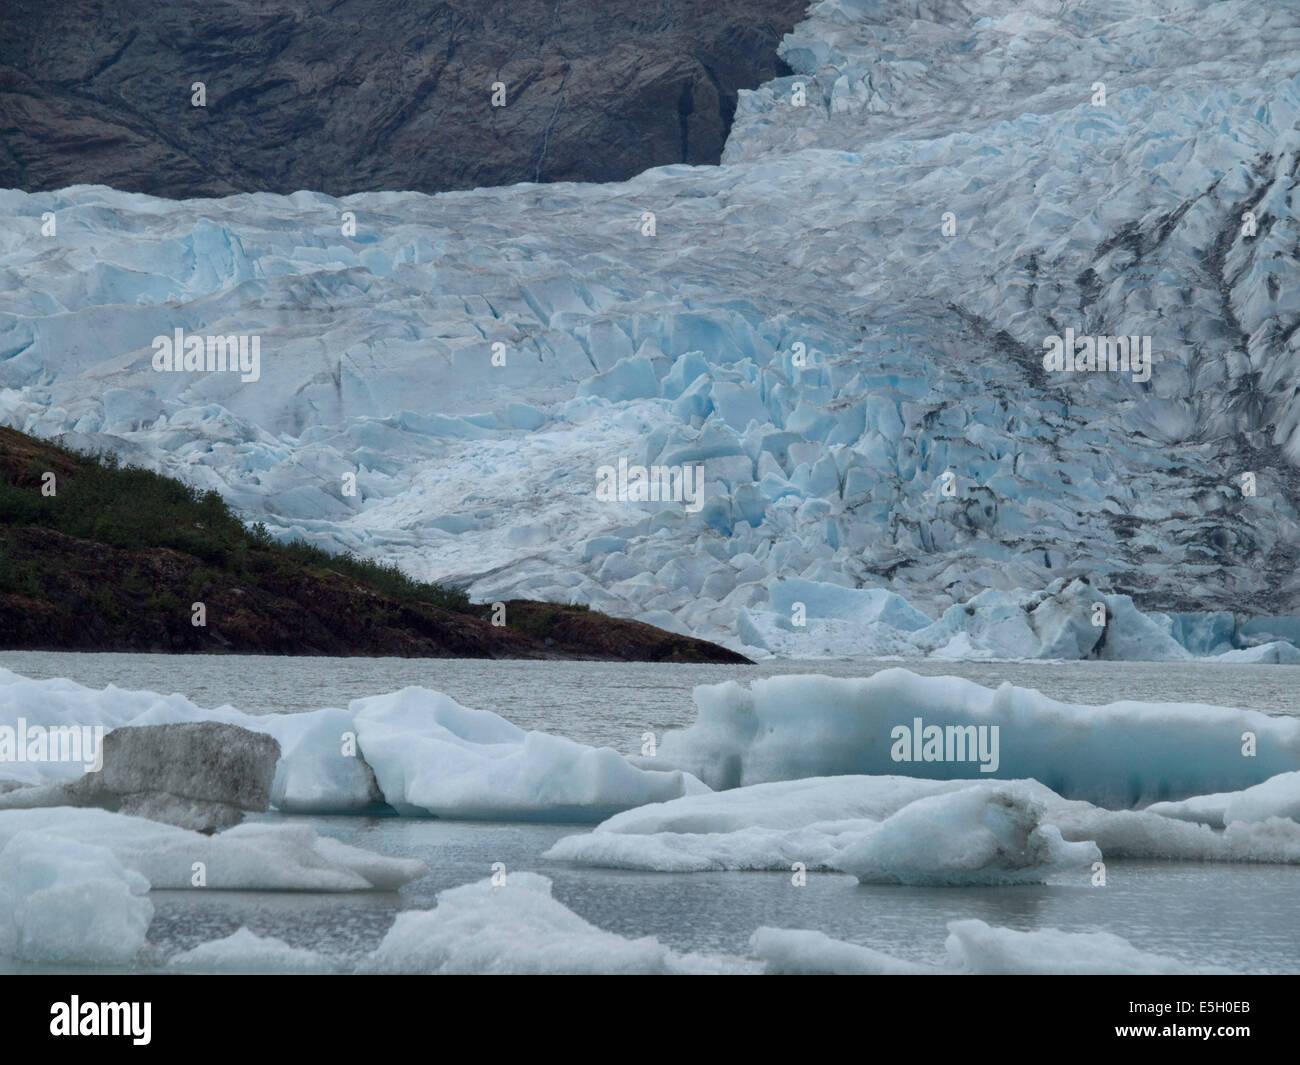 Alaska Glacier - Stock Image